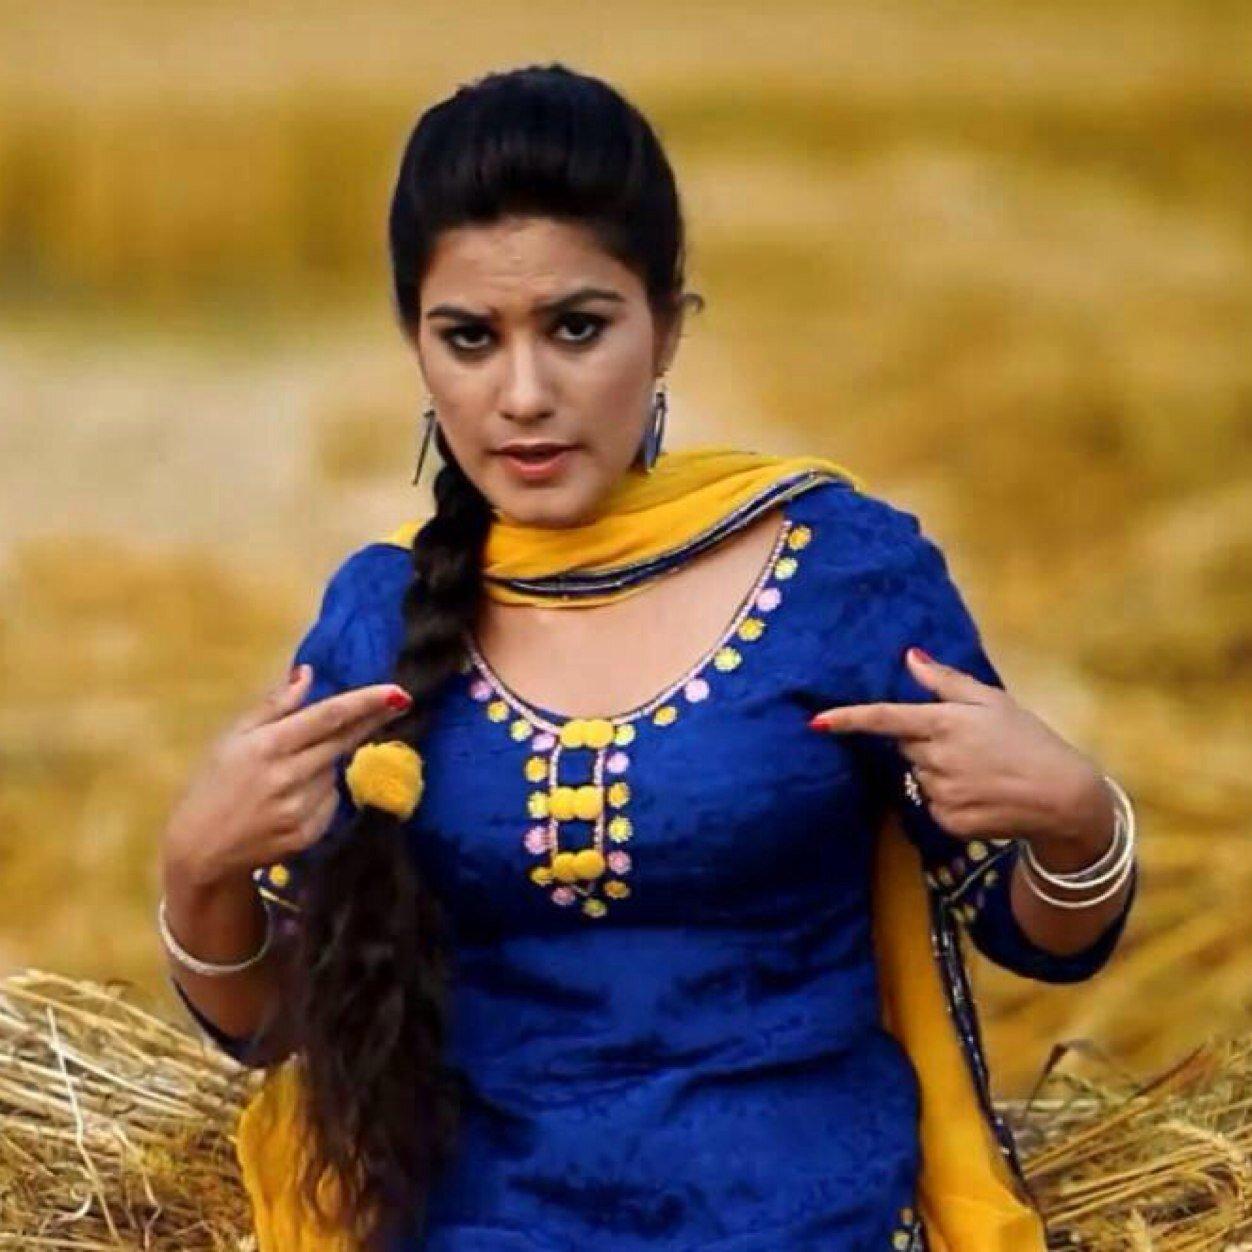 Panjabi girl